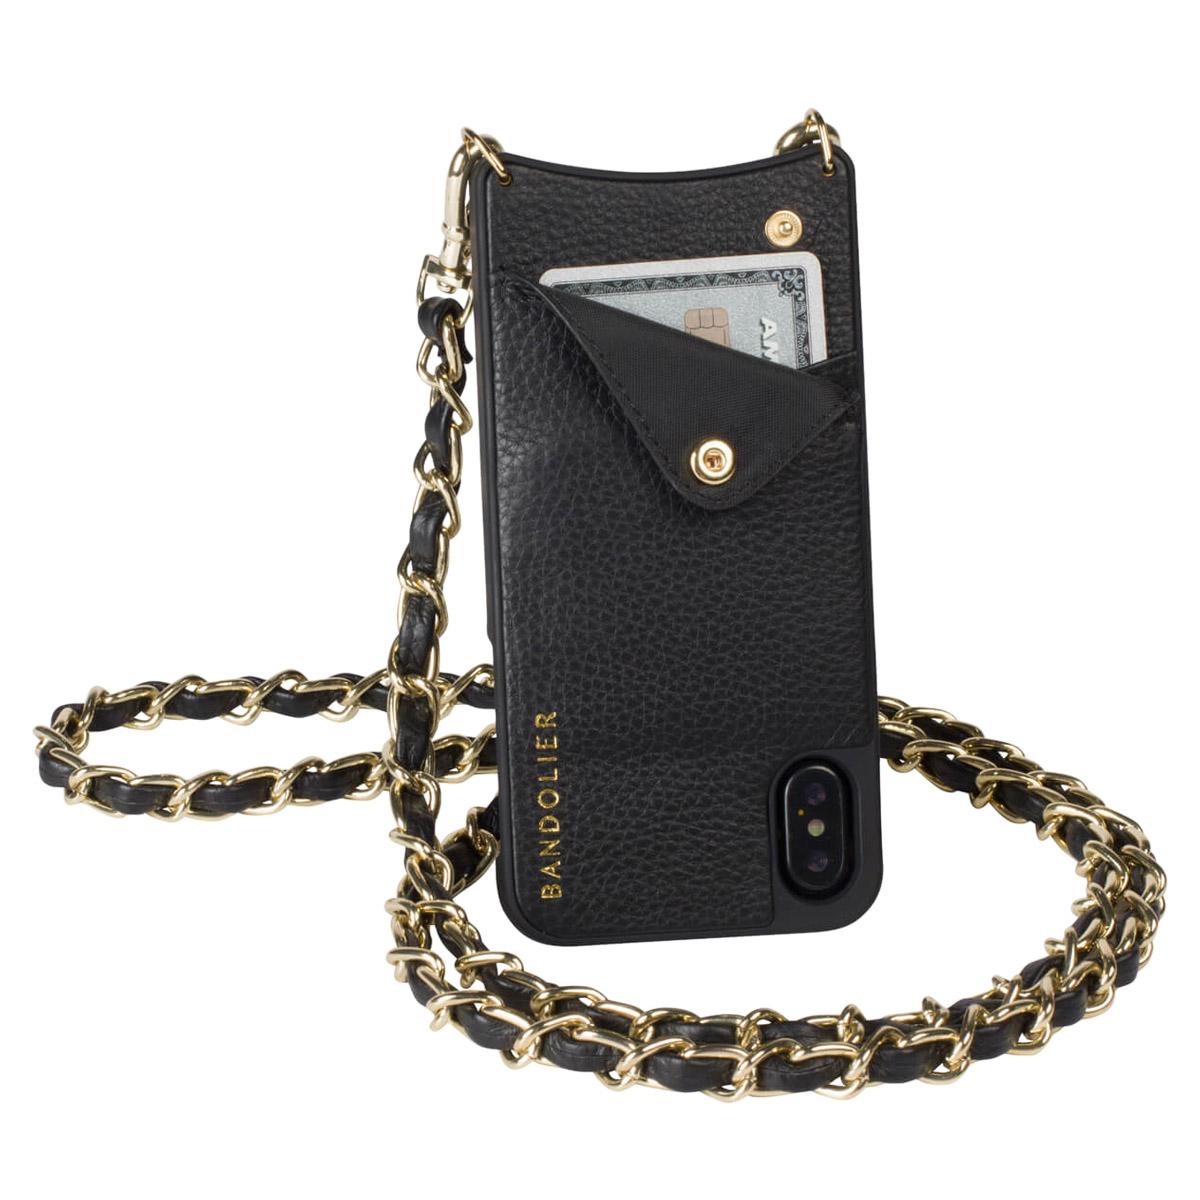 BANDOLIER iPhone XR LUCY GOLD バンドリヤー ケース ショルダー スマホ アイフォン レザー メンズ レディース ブラック 10LCY1001